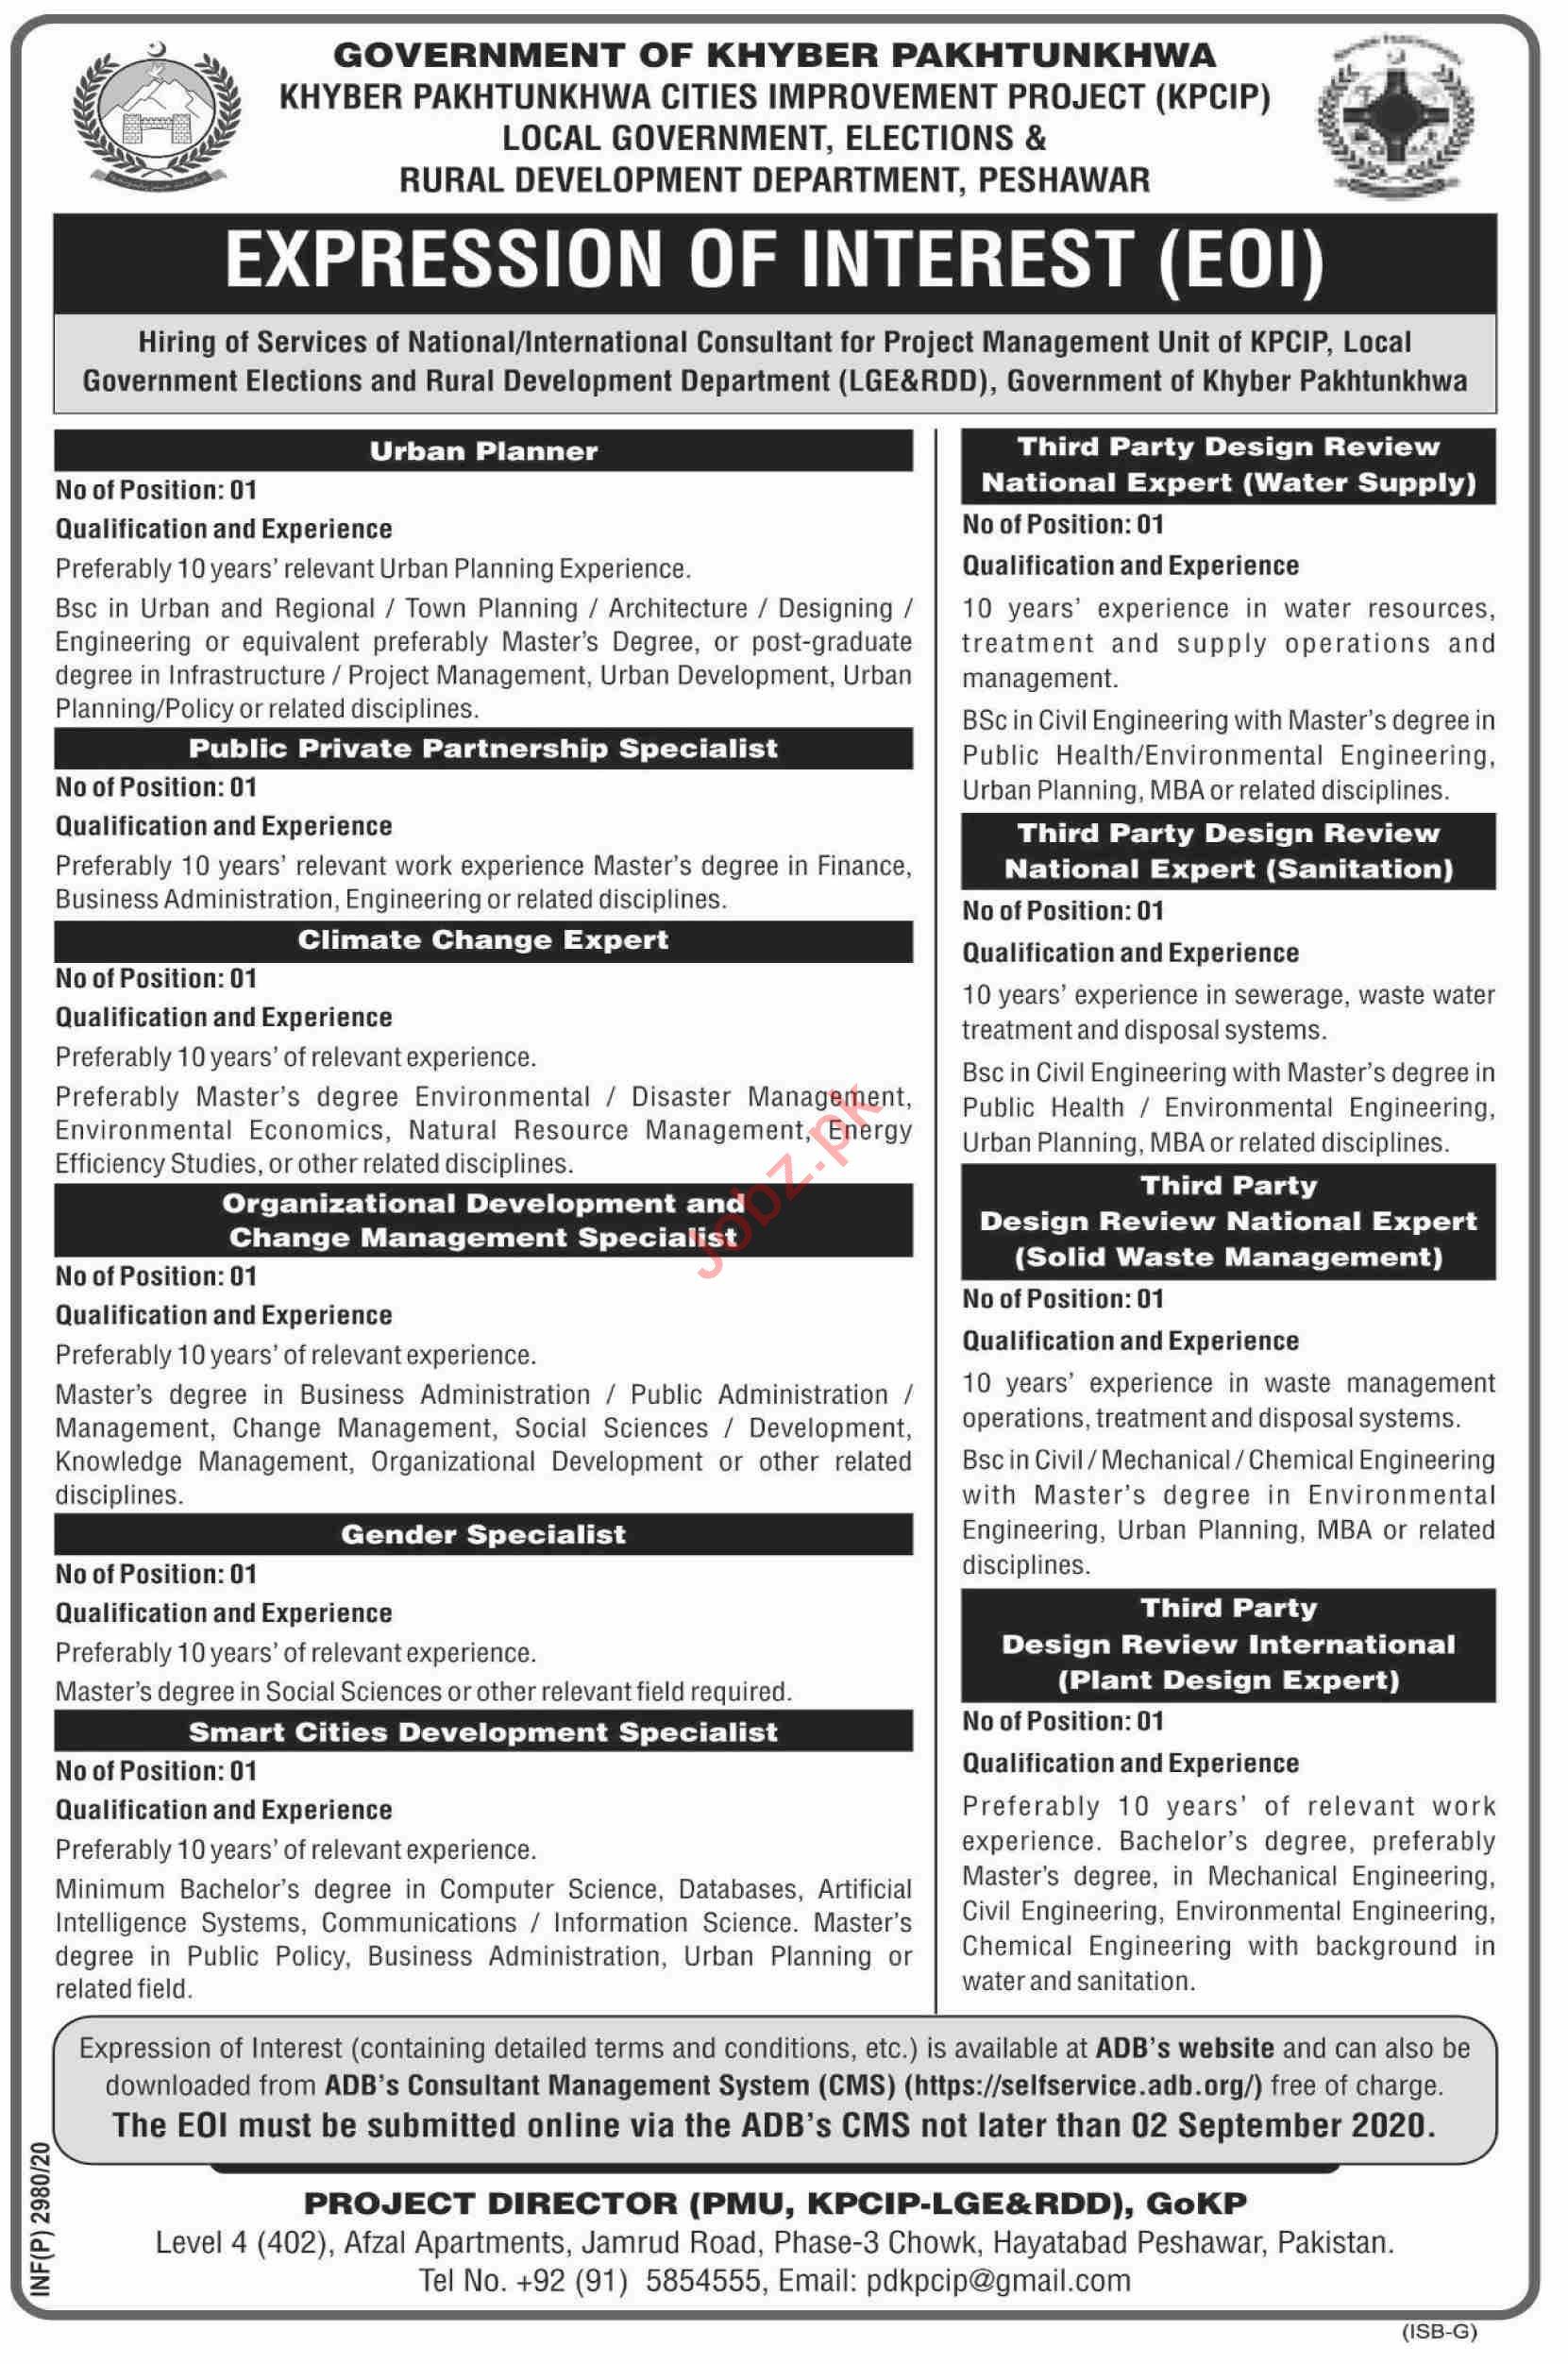 Khyber Pakhtunkhwa Cities Improvement Projects KPCIP Jobs